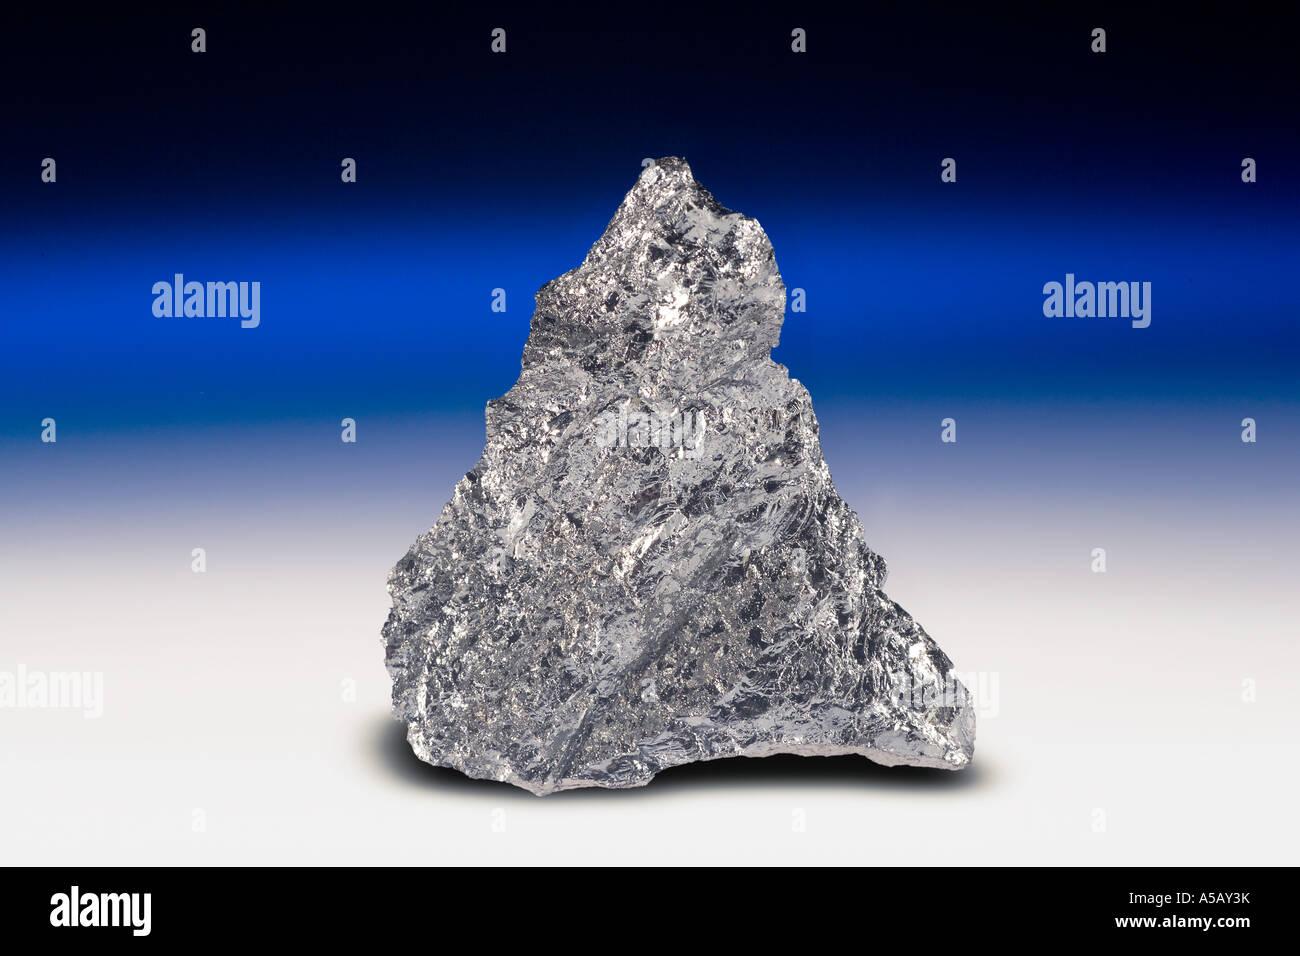 Elemental Silicon - Stock Image